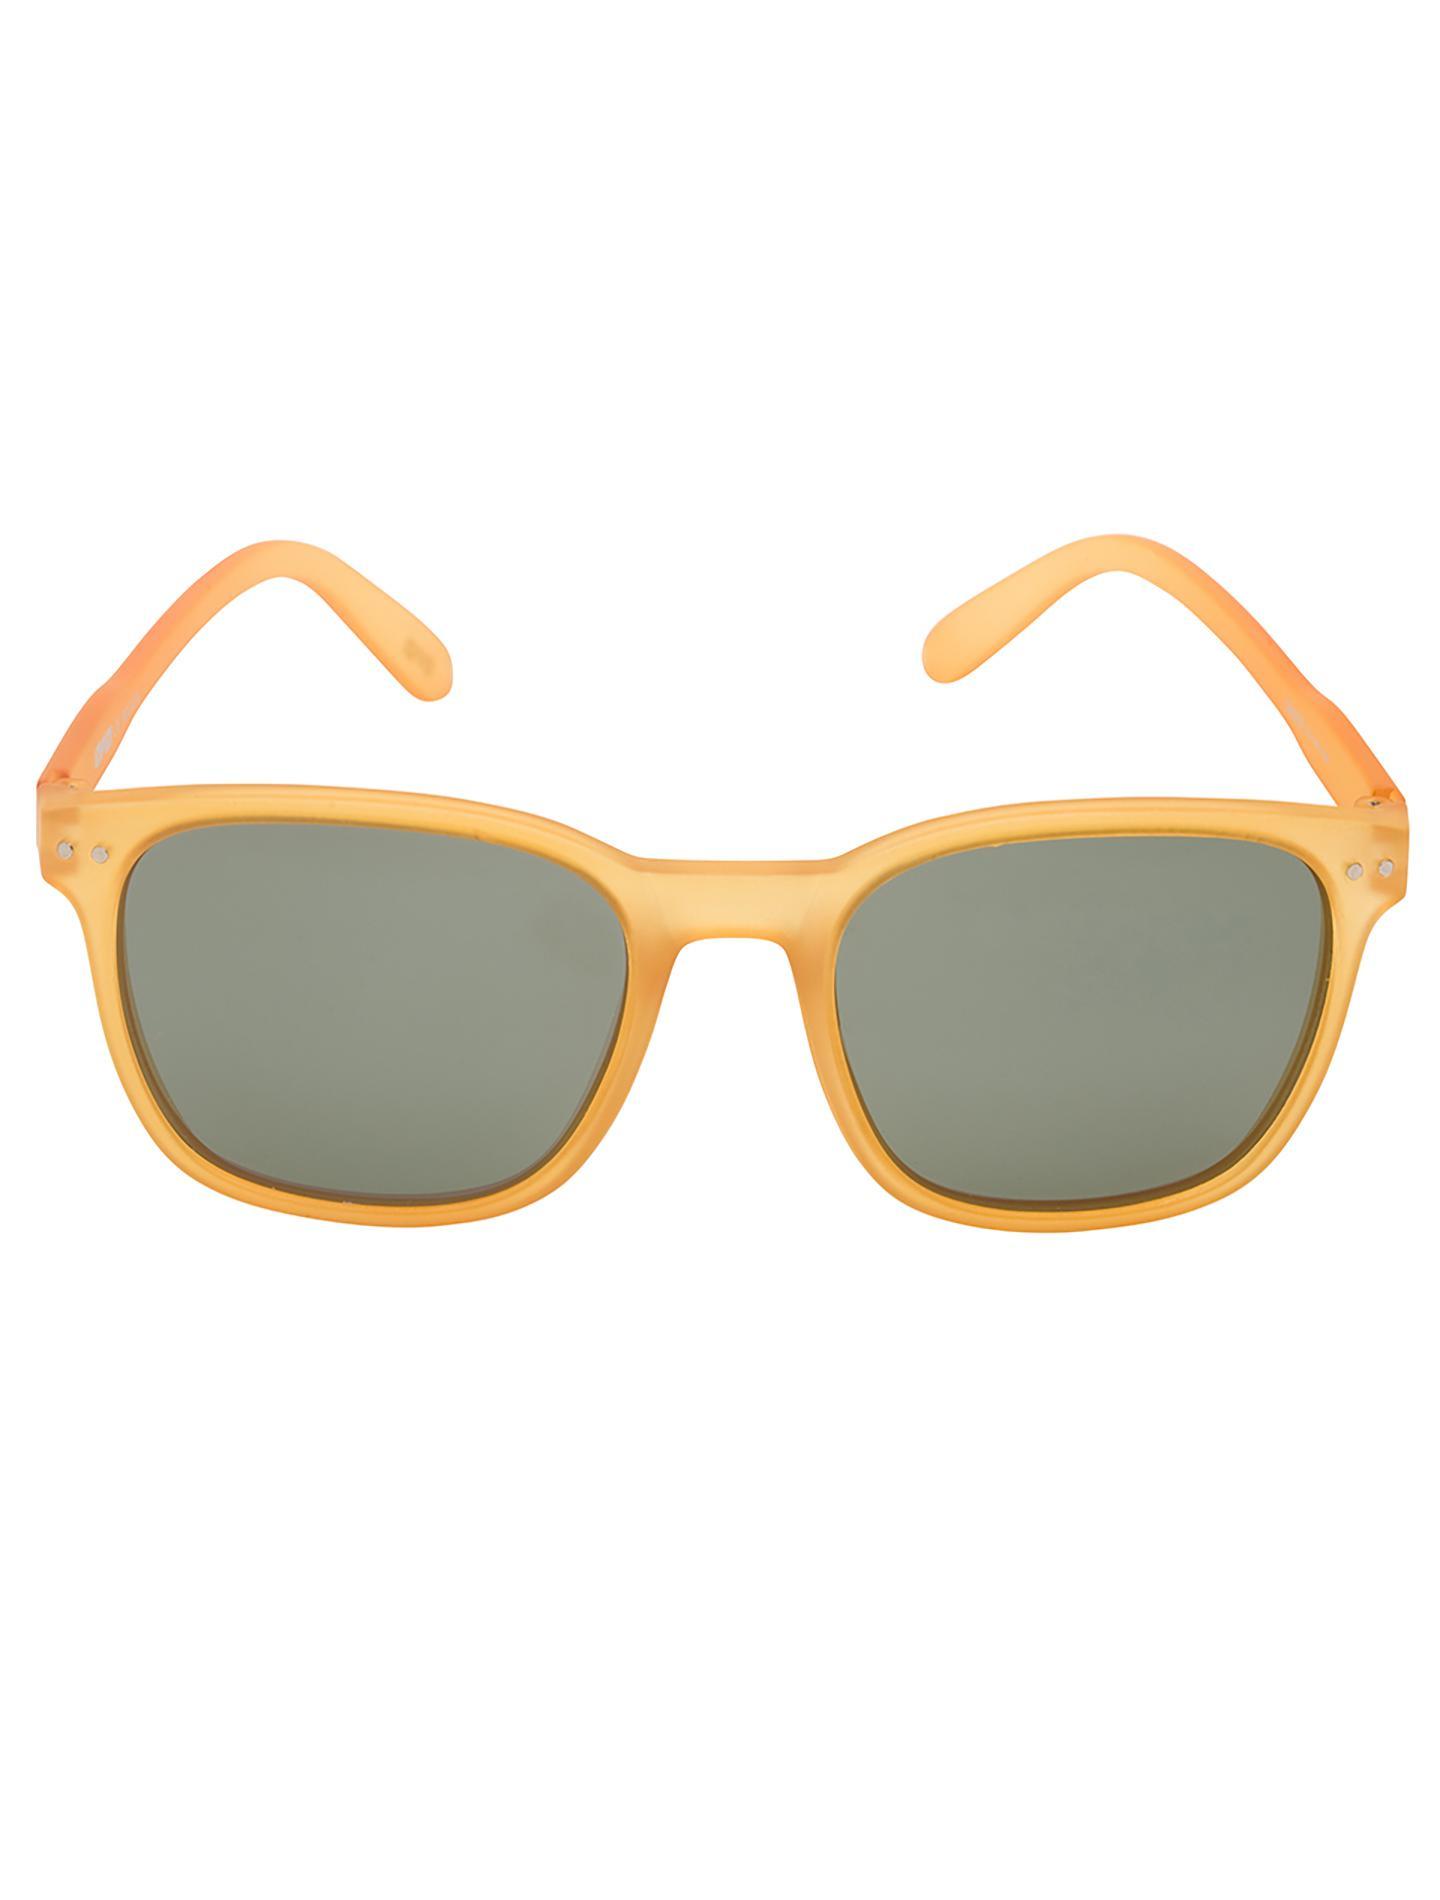 ad7d06dd416 ... Izipizi Sun Nautic Polarized Sunglasses for Men - Lyst. View fullscreen